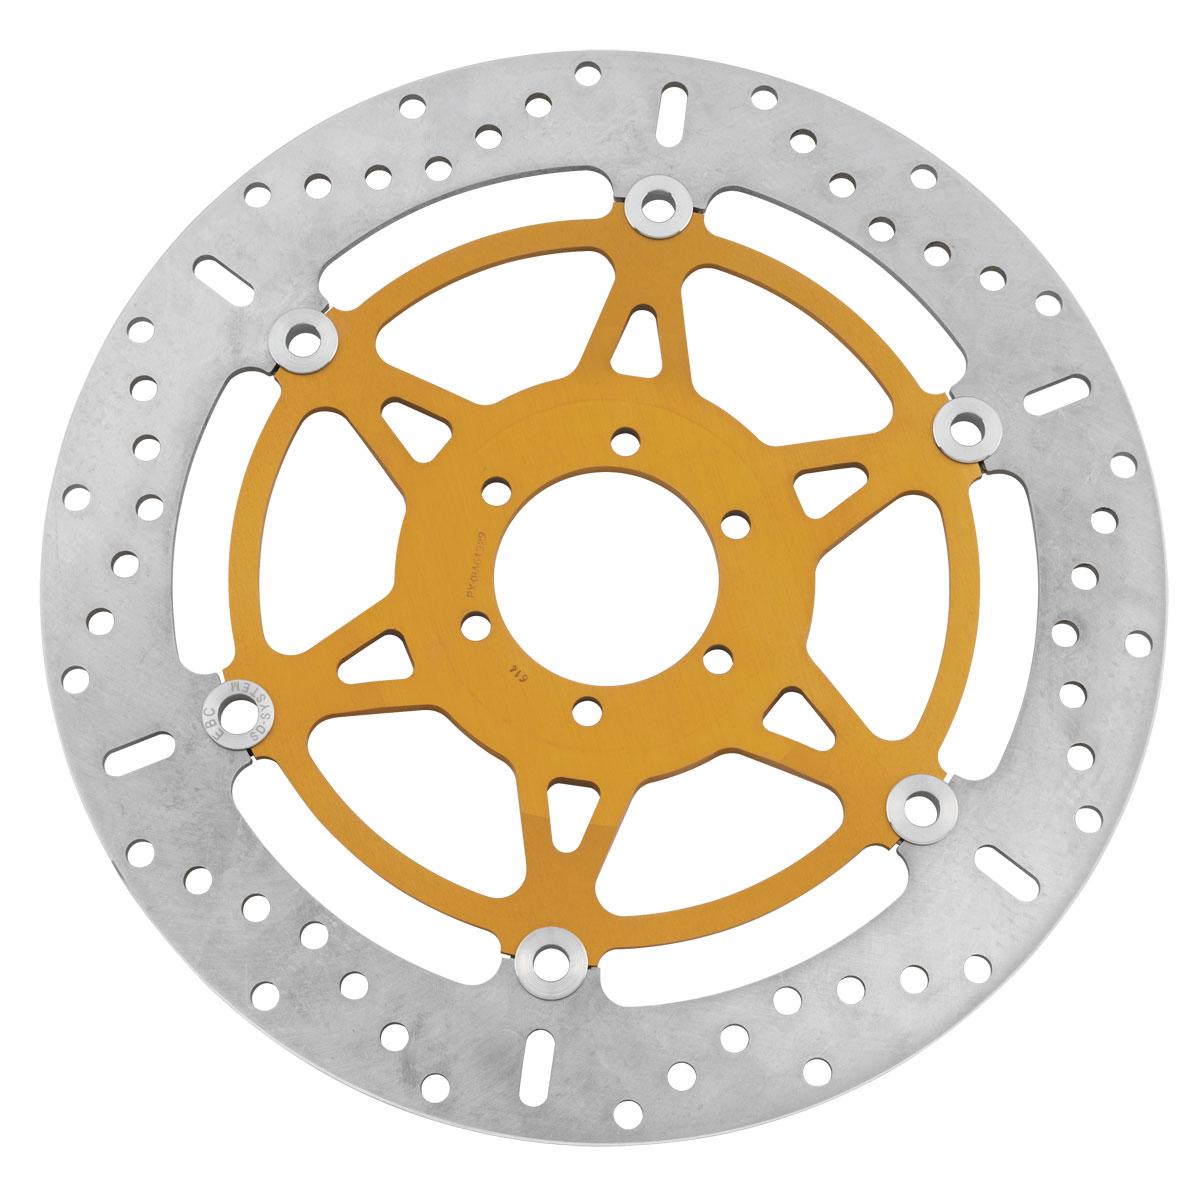 EBC Pro-Lite Front Right/Left Brake Rotor